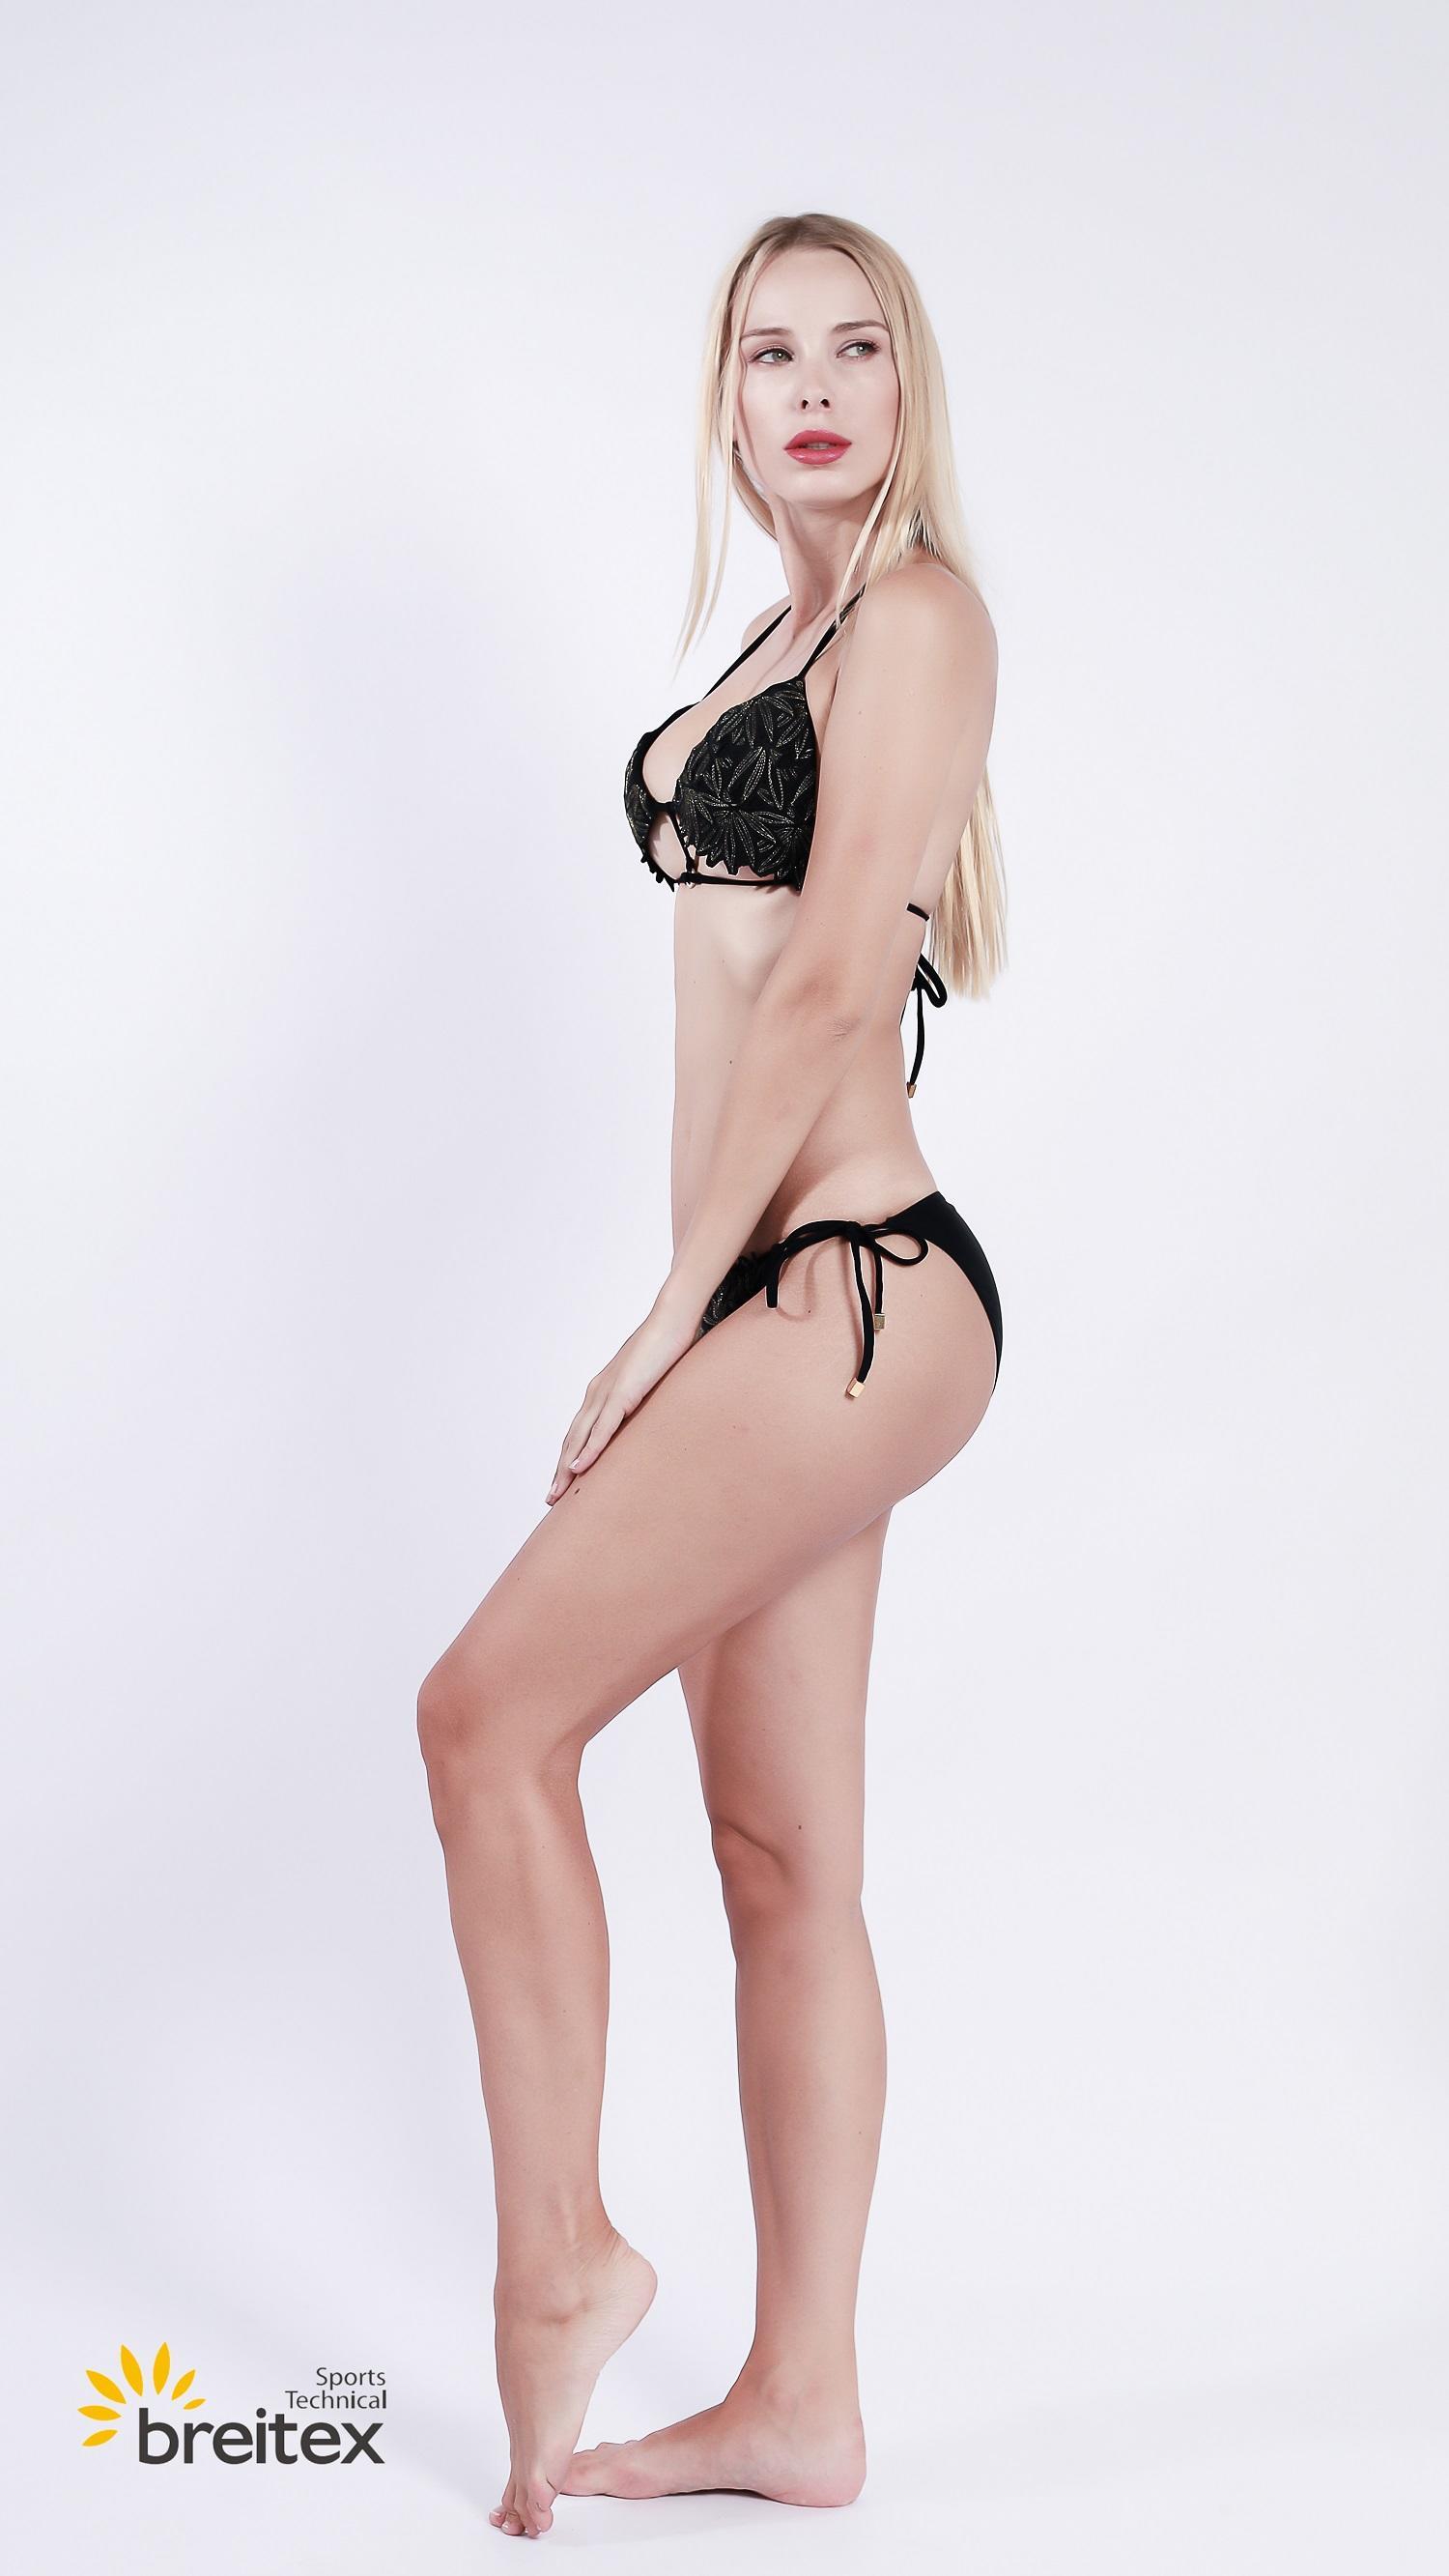 product-Breitex-Breitex bikini set in floral lurex thread embroidery-img